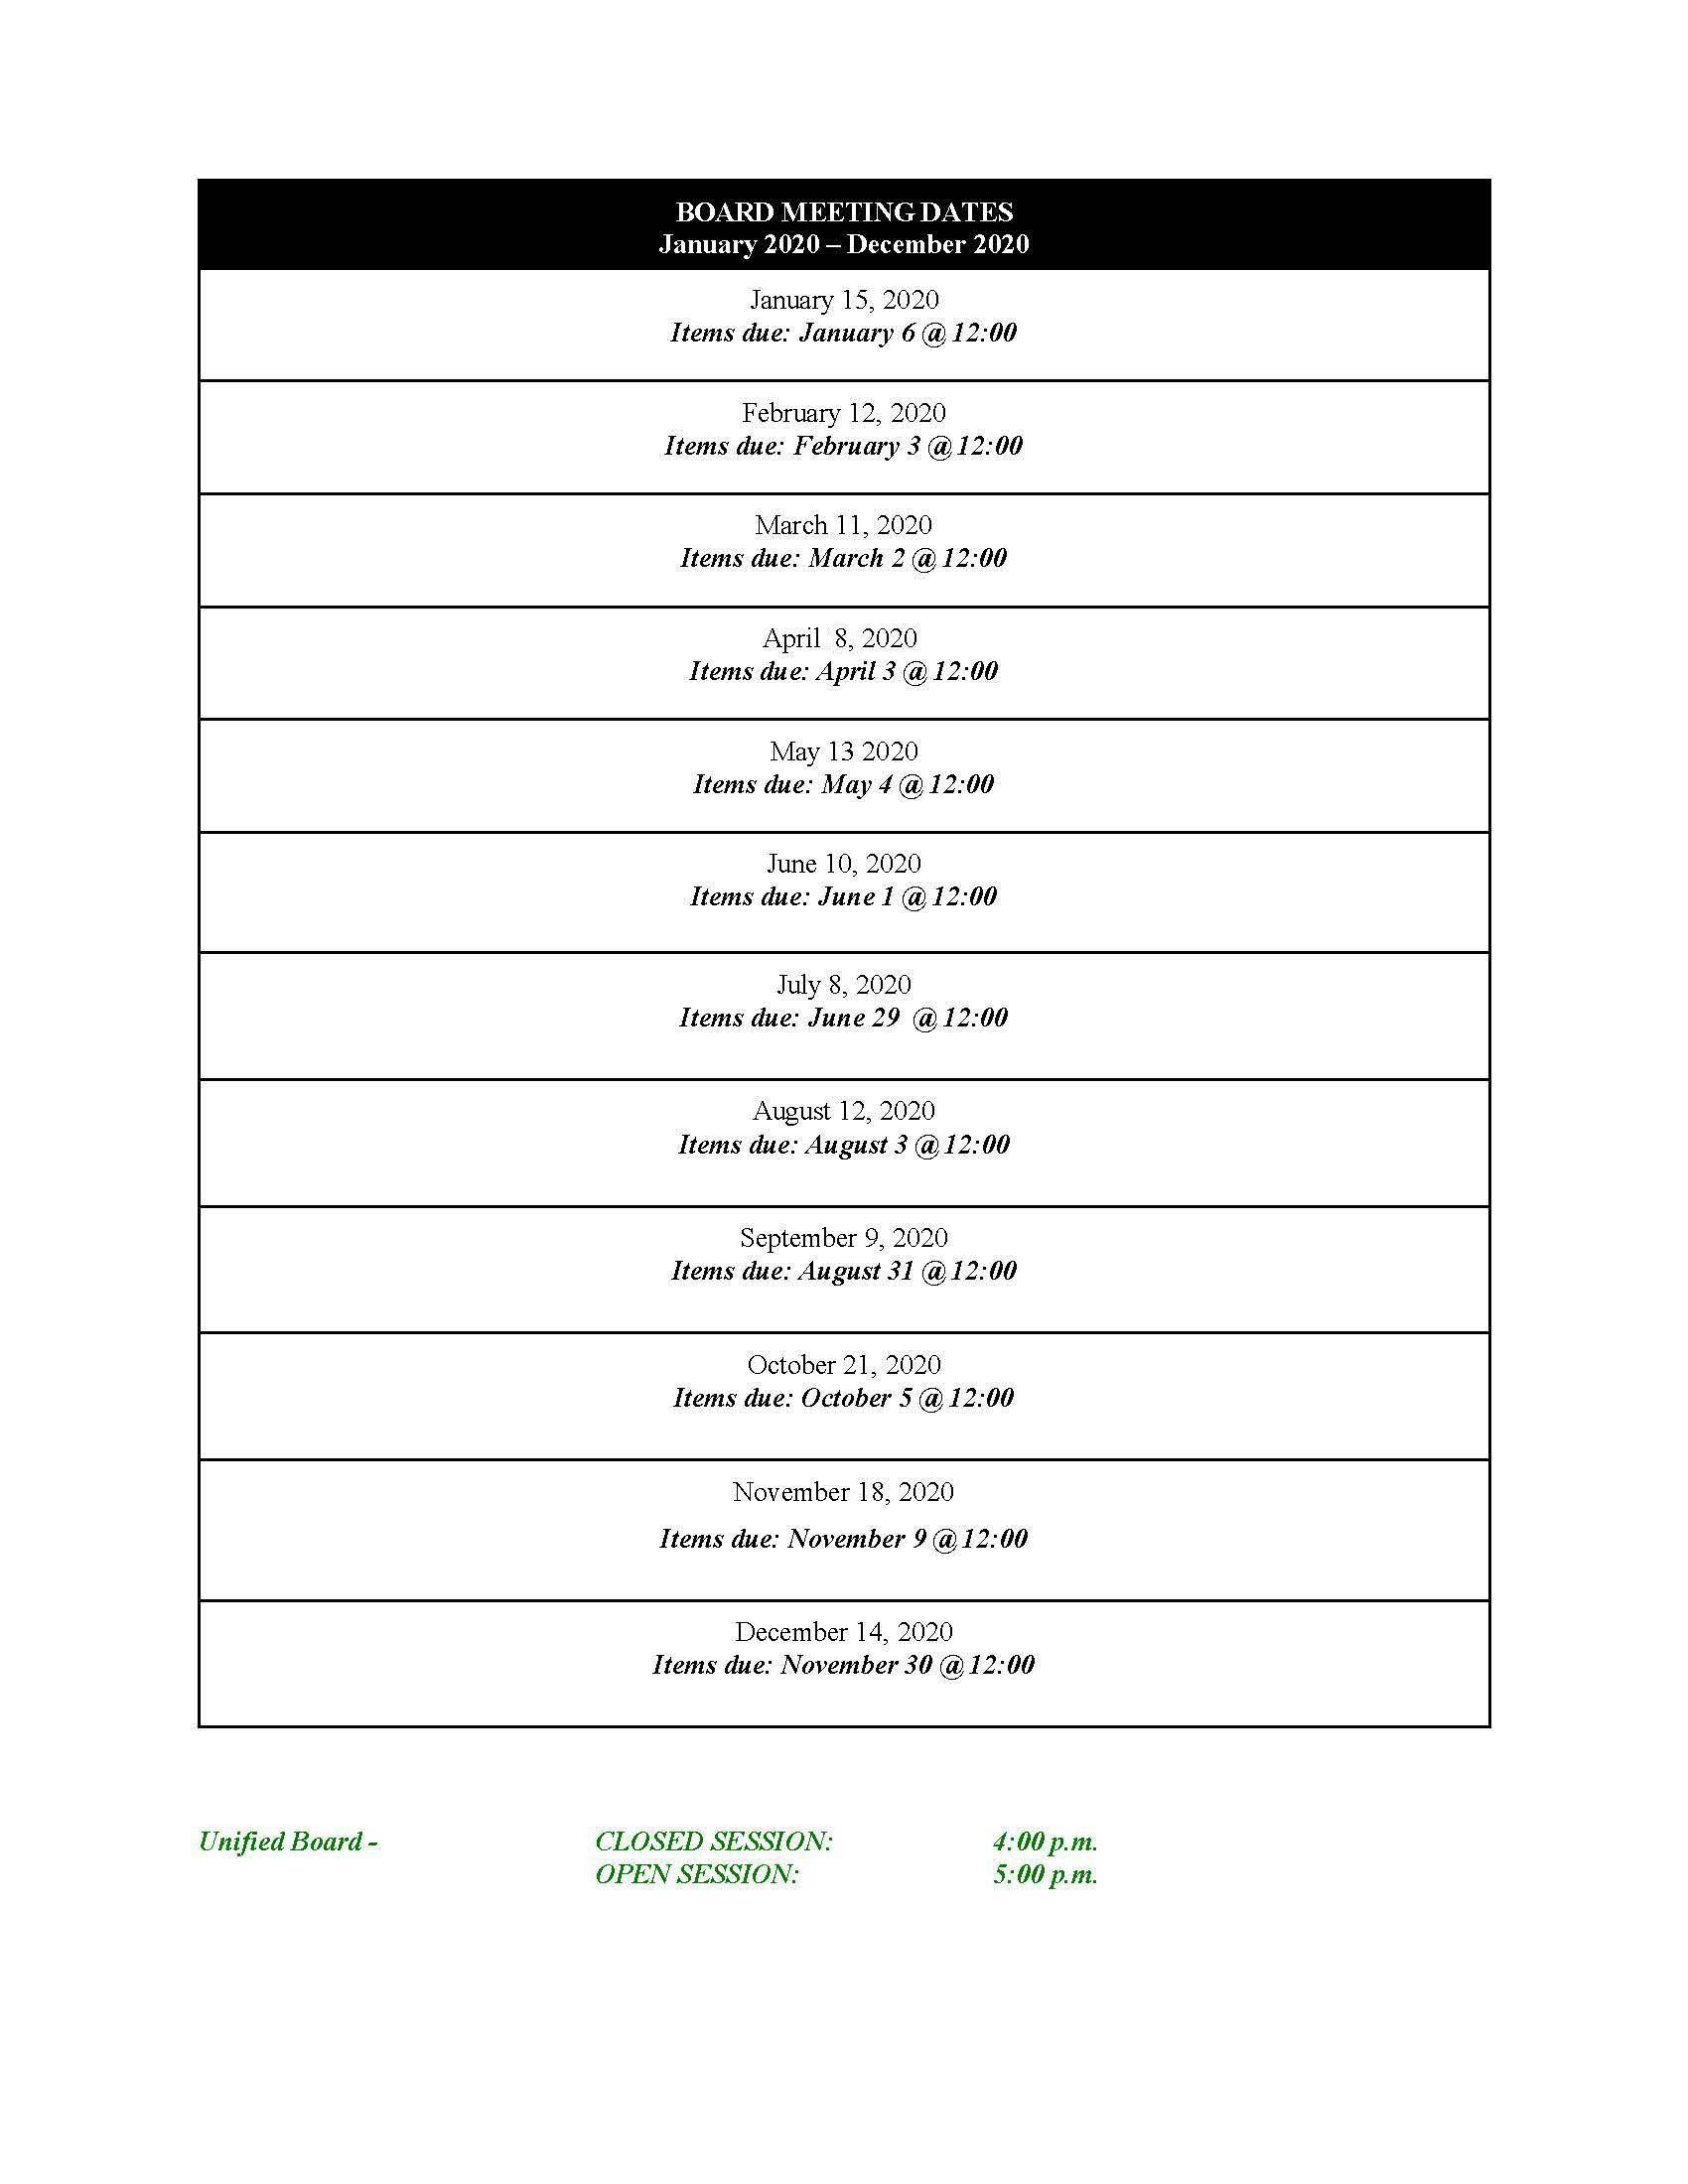 EUSD School Board Meeting Dates 2019-2020